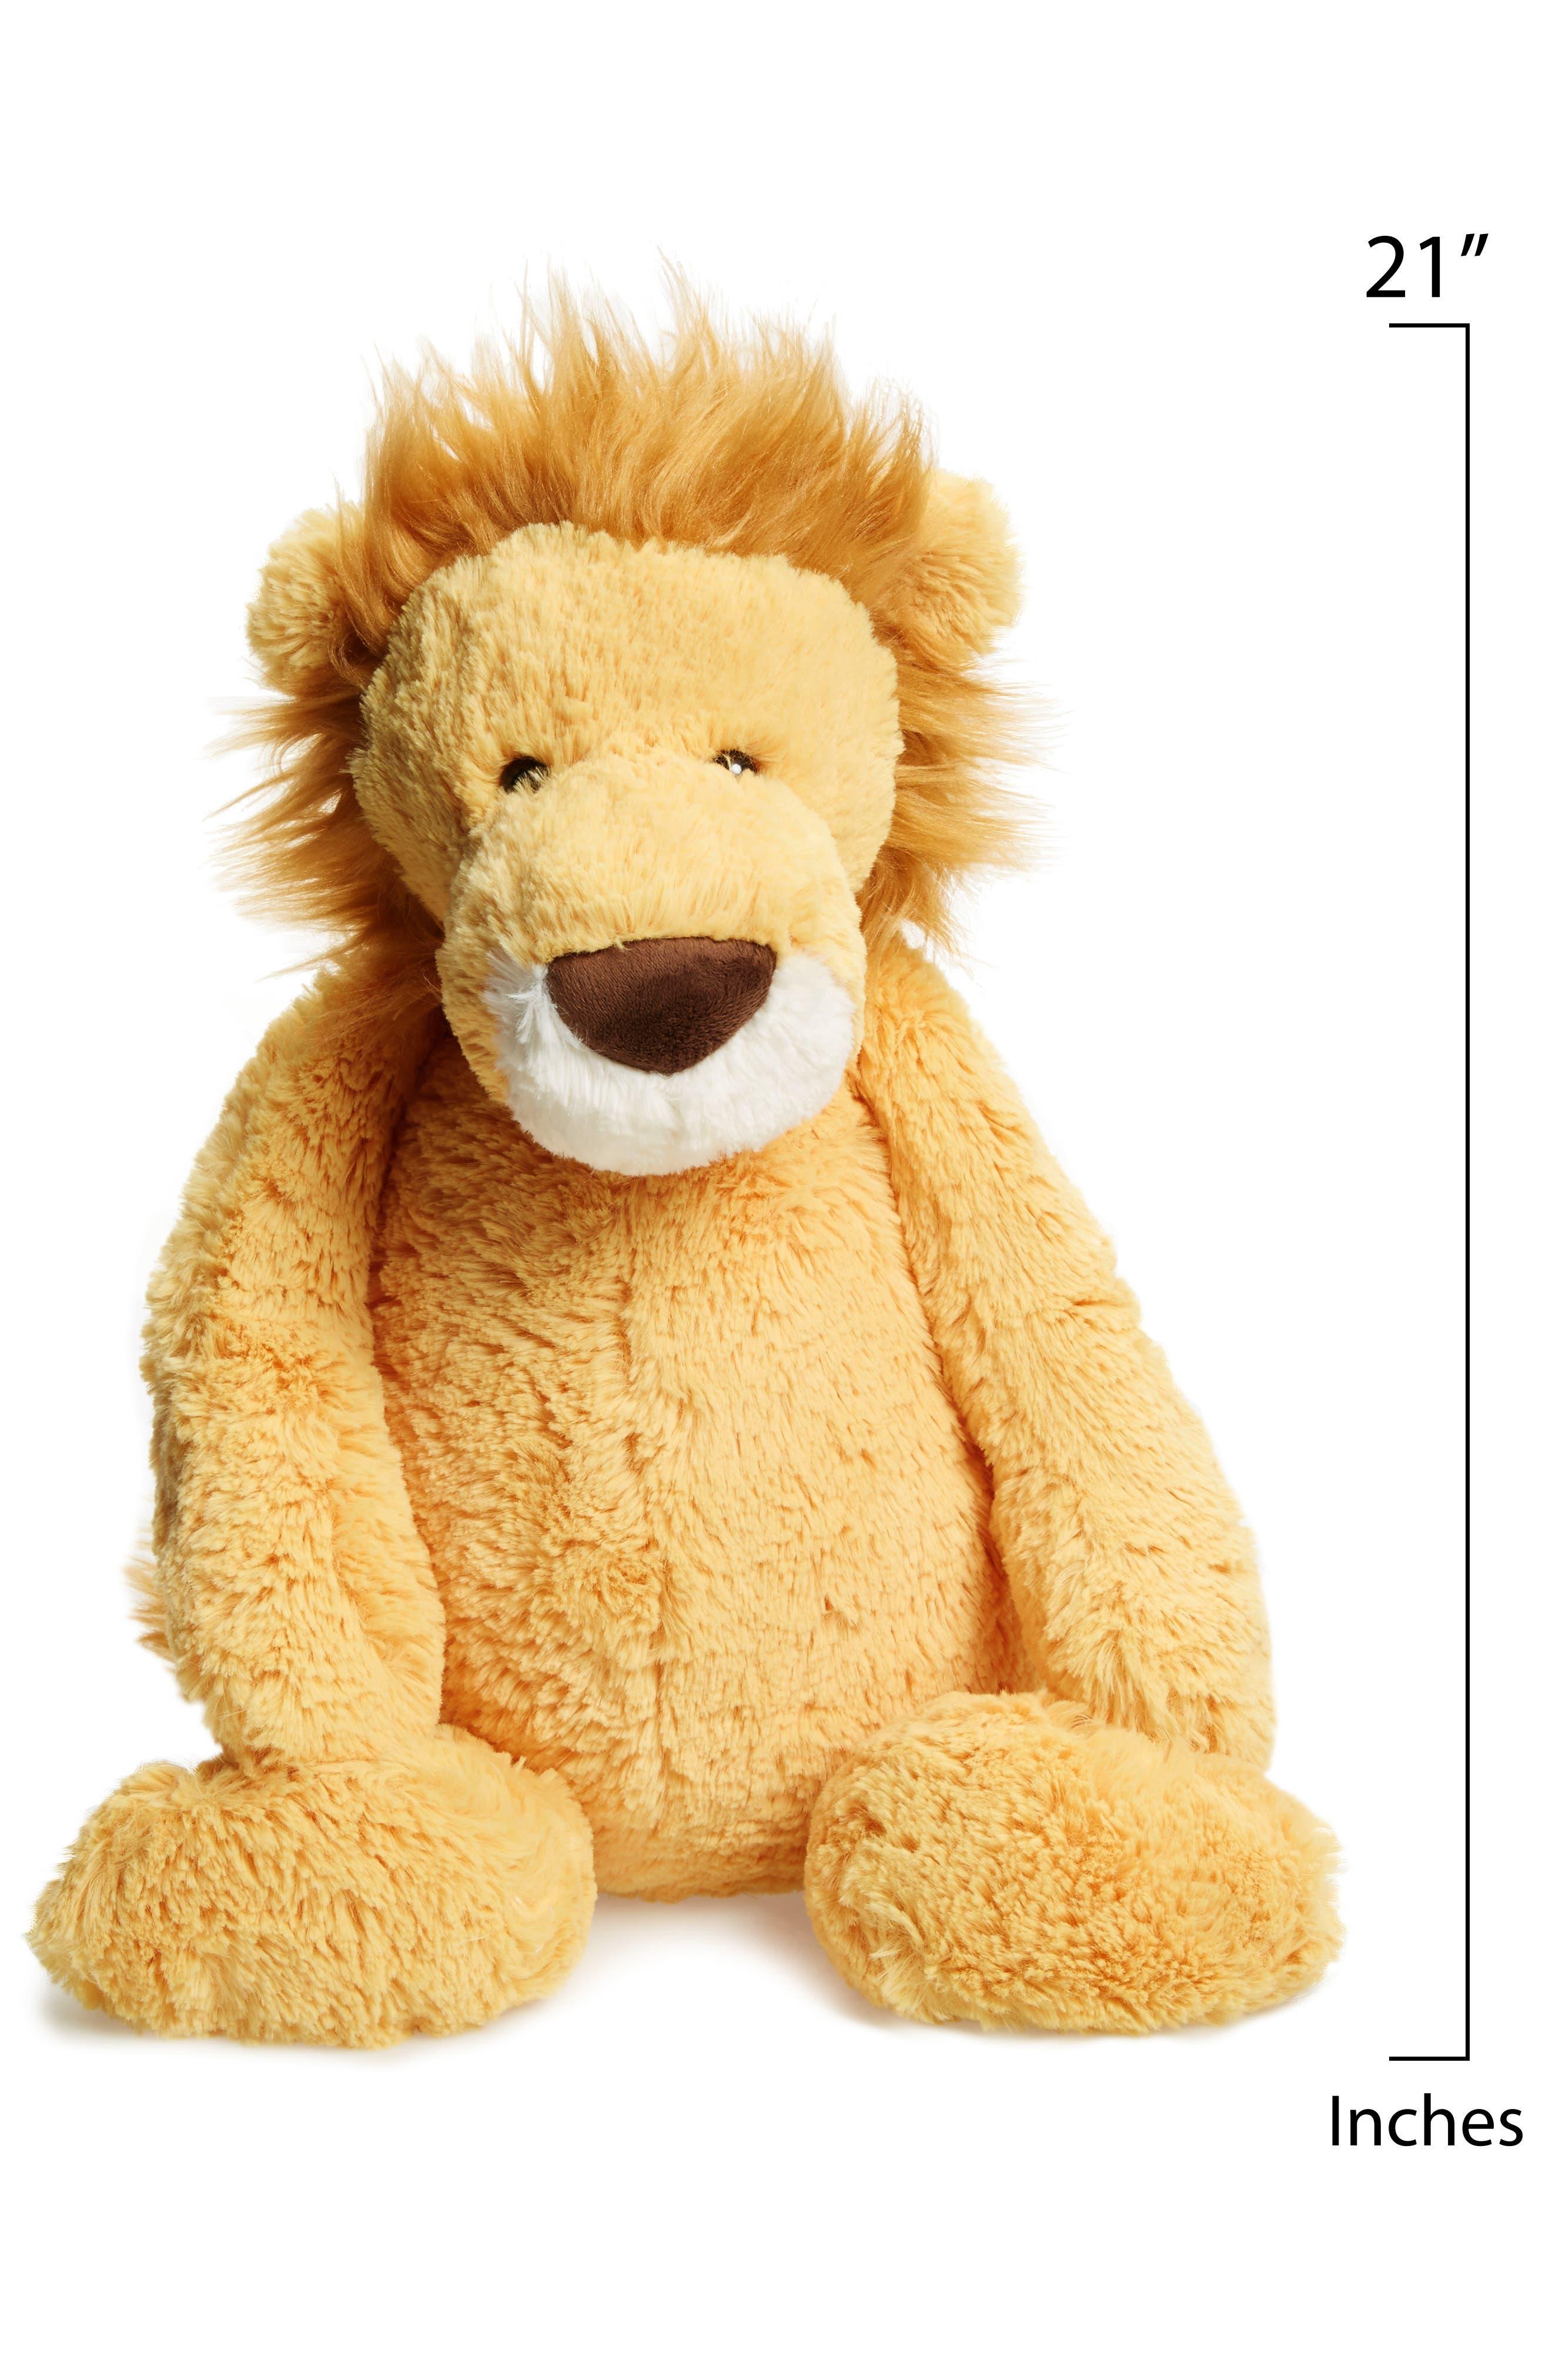 Huge Bashful Lion Stuffed Animal,                             Alternate thumbnail 2, color,                             Yellow